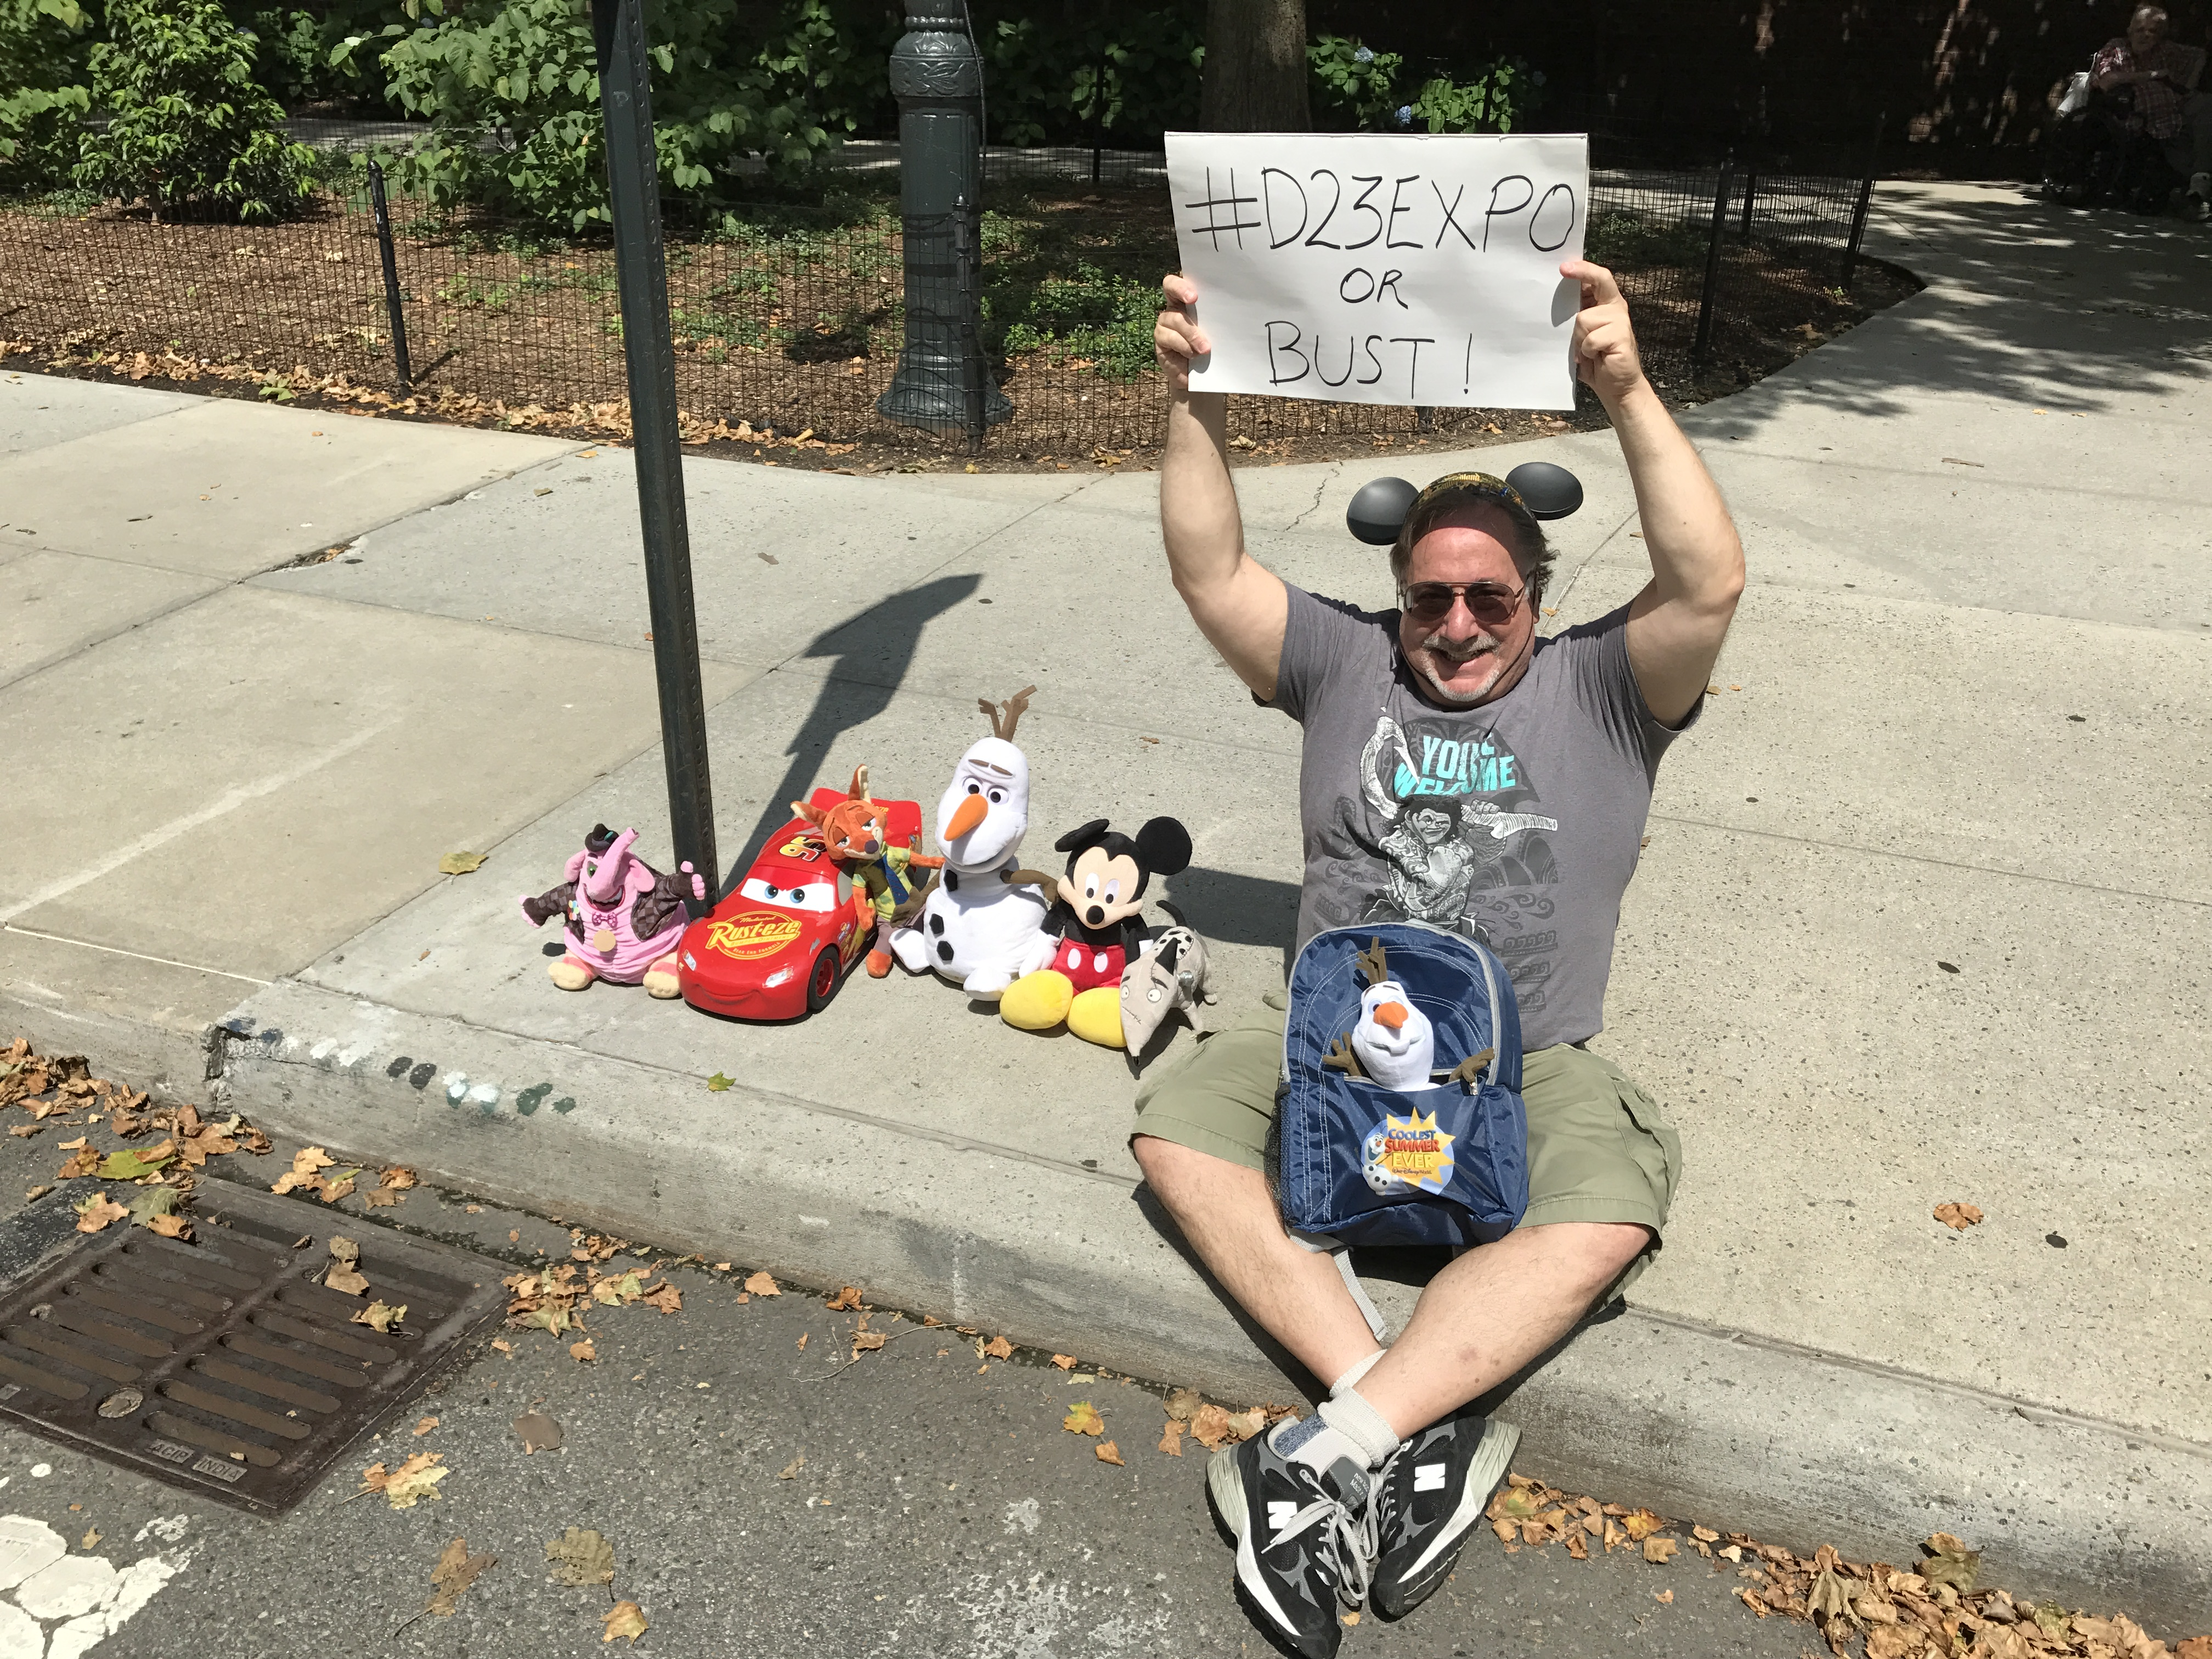 """#D23Expo, Or Bust! w/Linky! #Disneyland #SummerOfHeroes #DuckTales"""